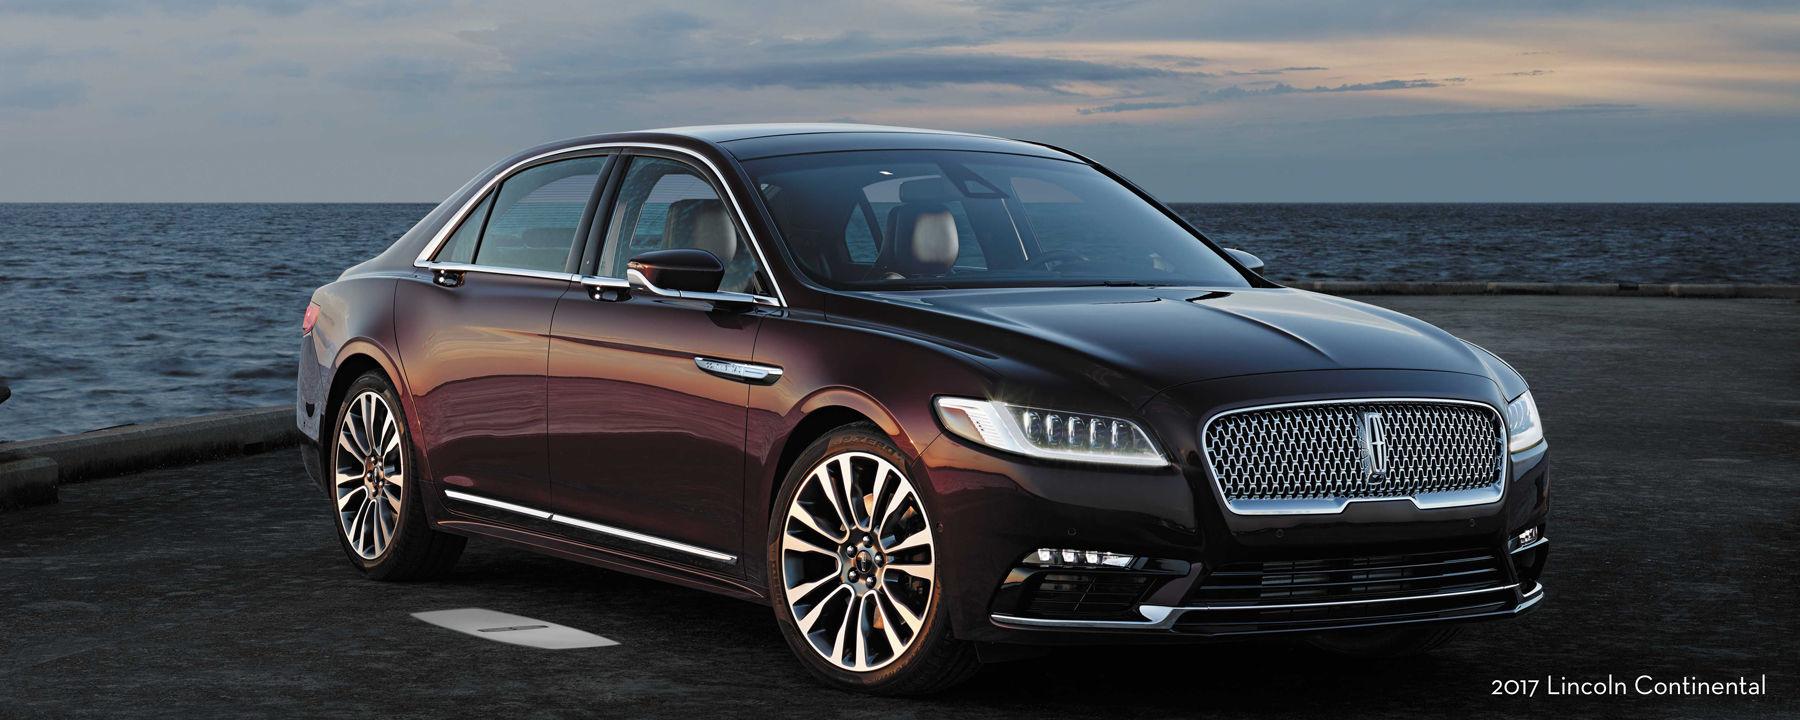 2017 Midlands International Auto Show - Lincoln Continental